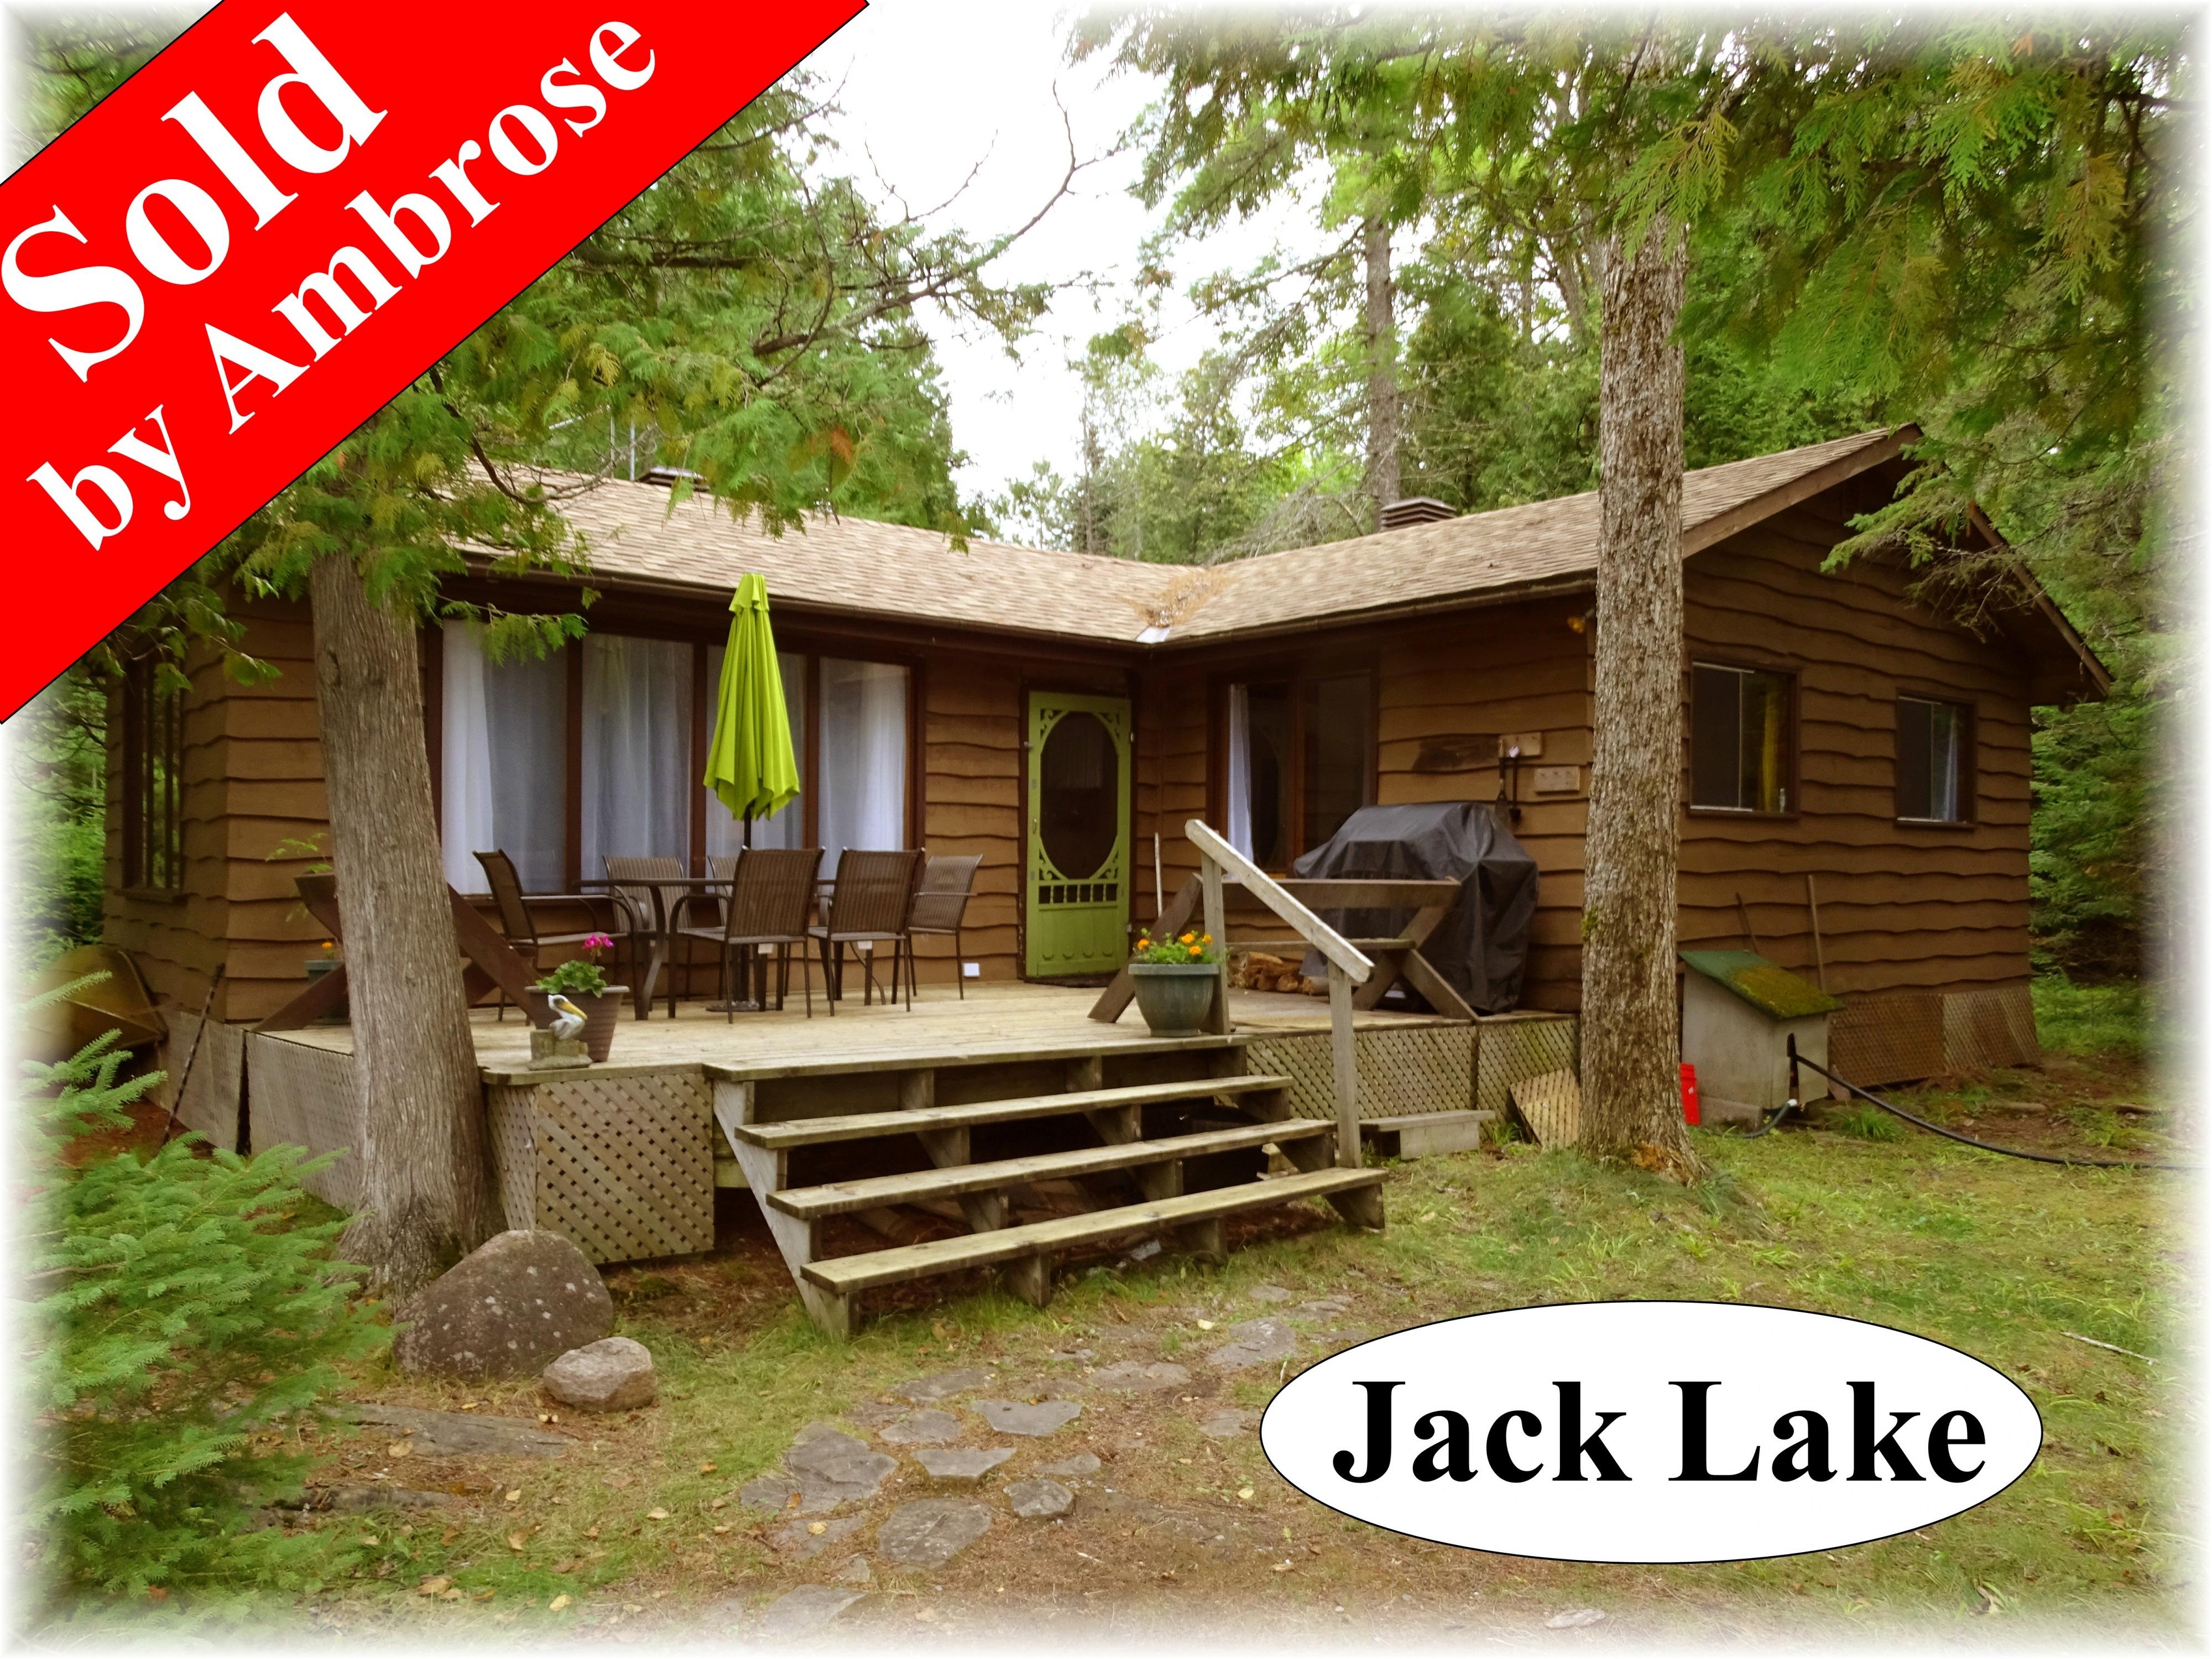 1205 Jack Lake  Boat Access, Apsley, Ontario, Canada